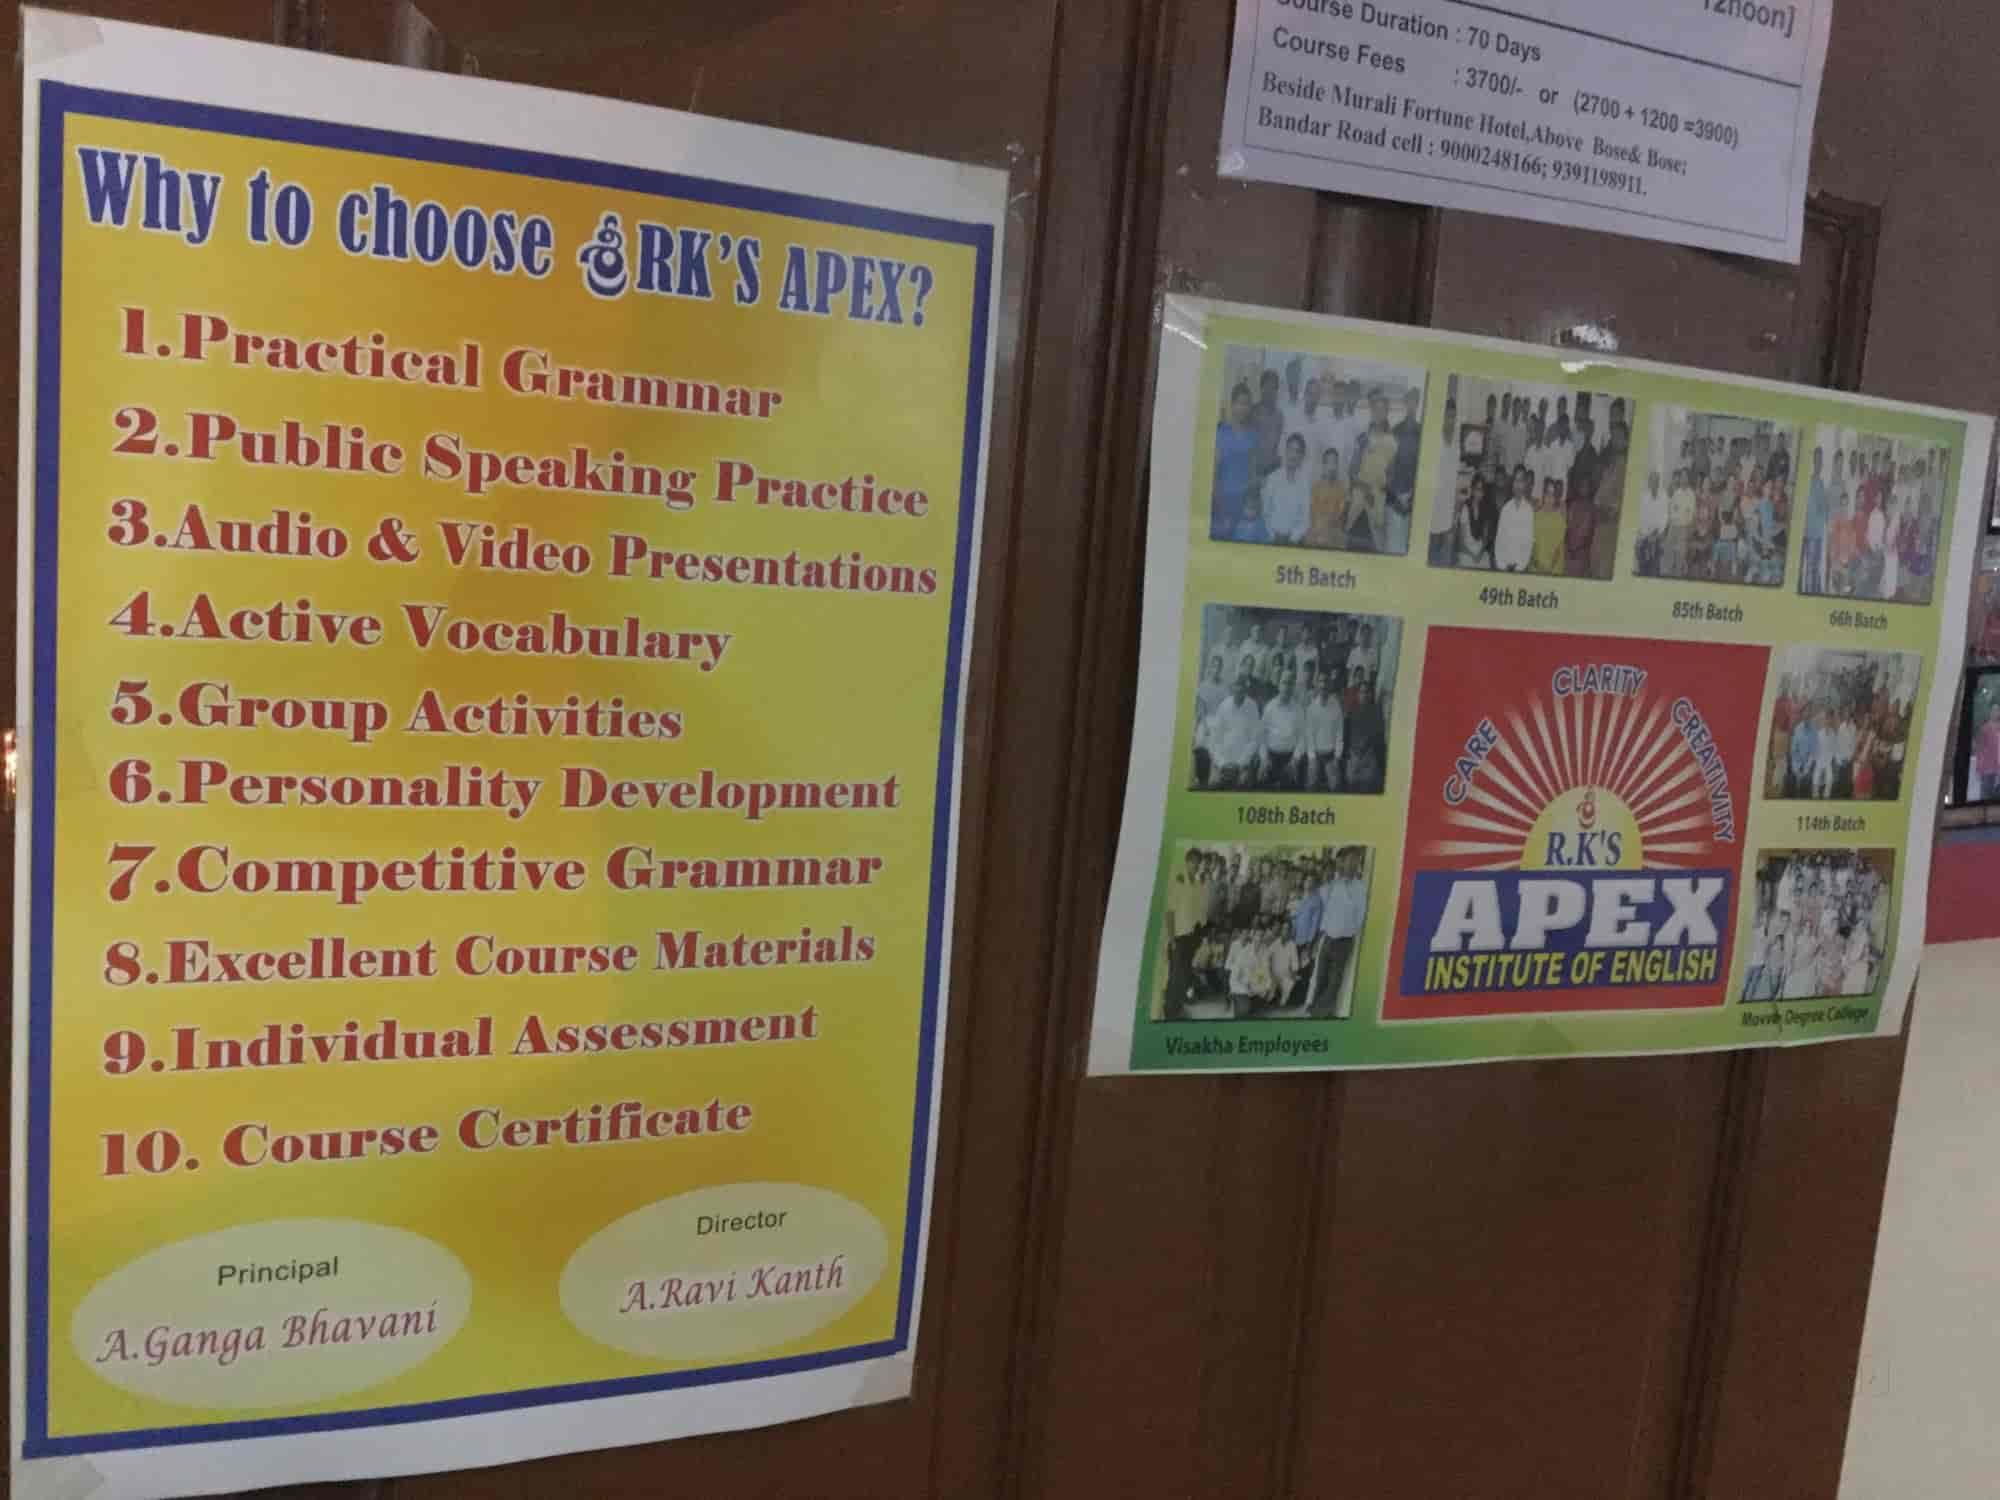 Rks Apex Institute Of English, MG Road - Language Classes